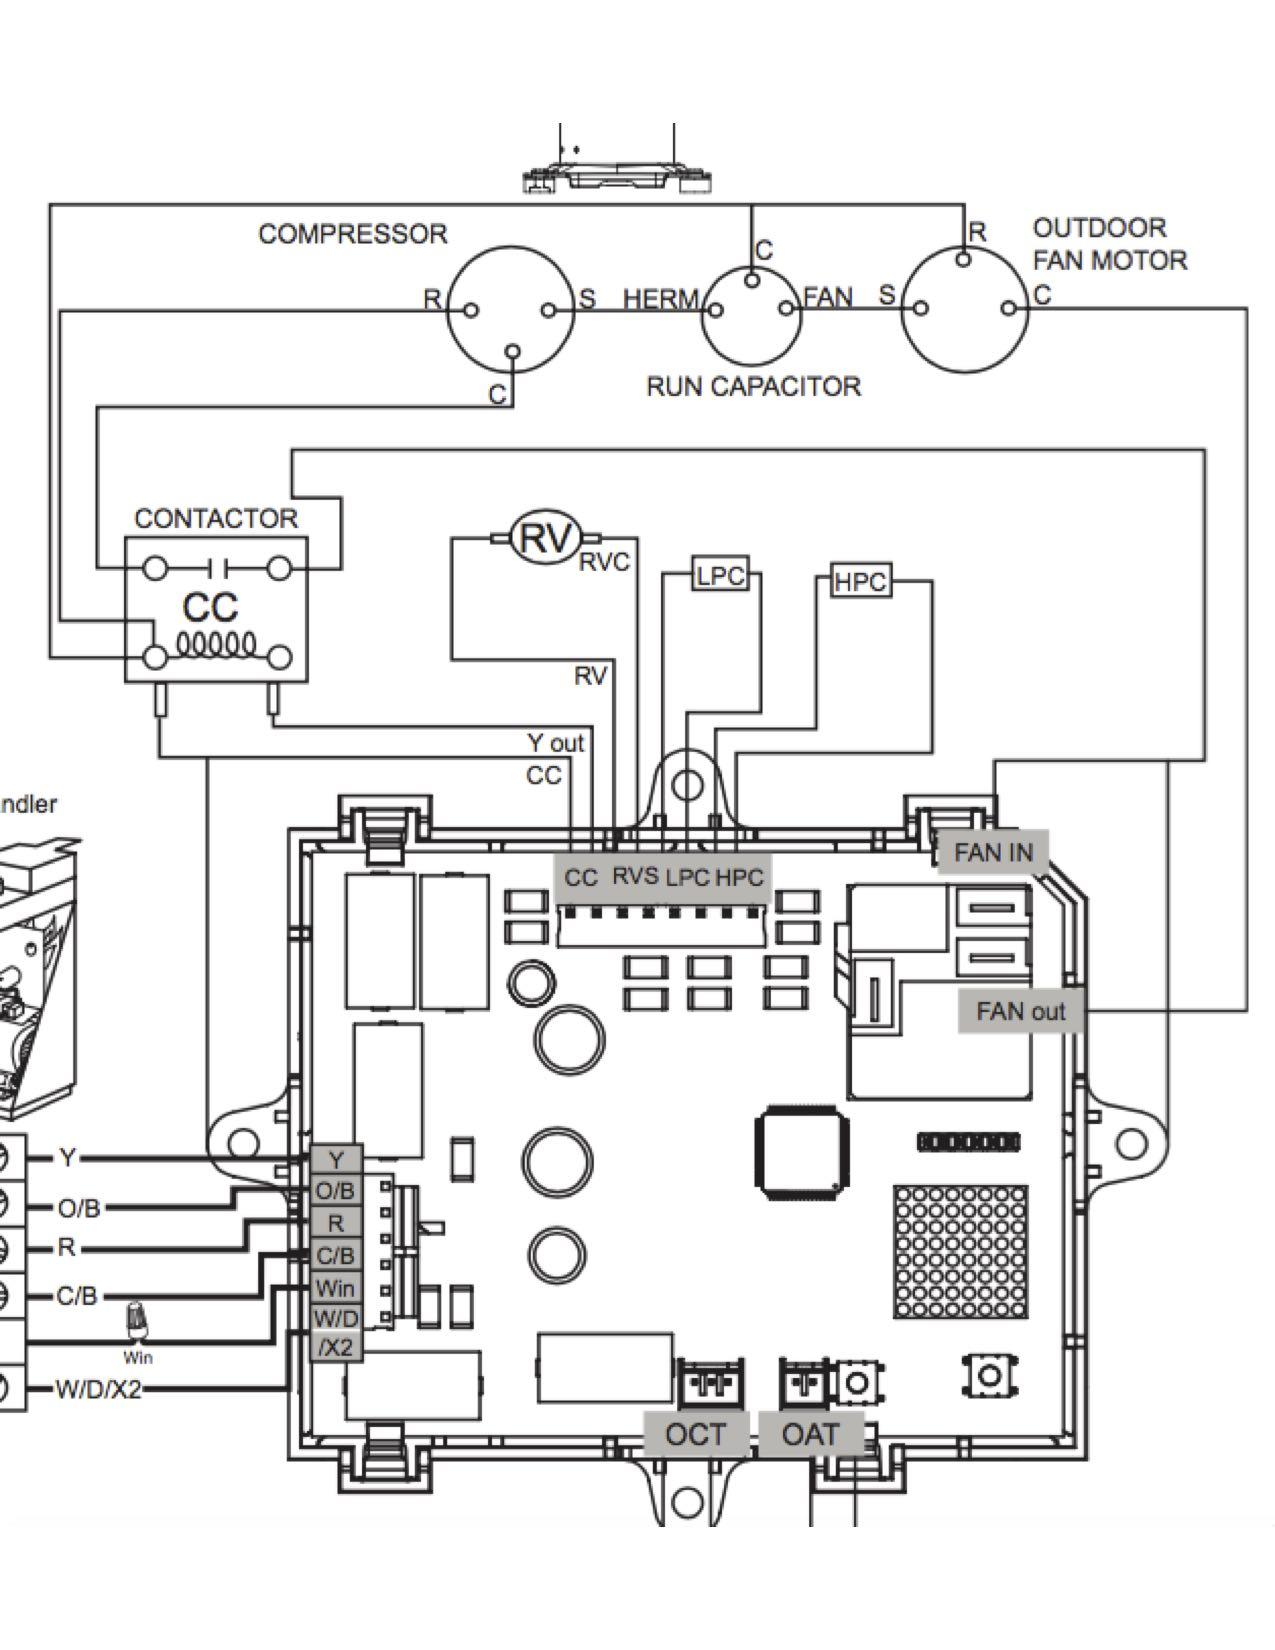 Miele Wkb120 Washing Machine Manual